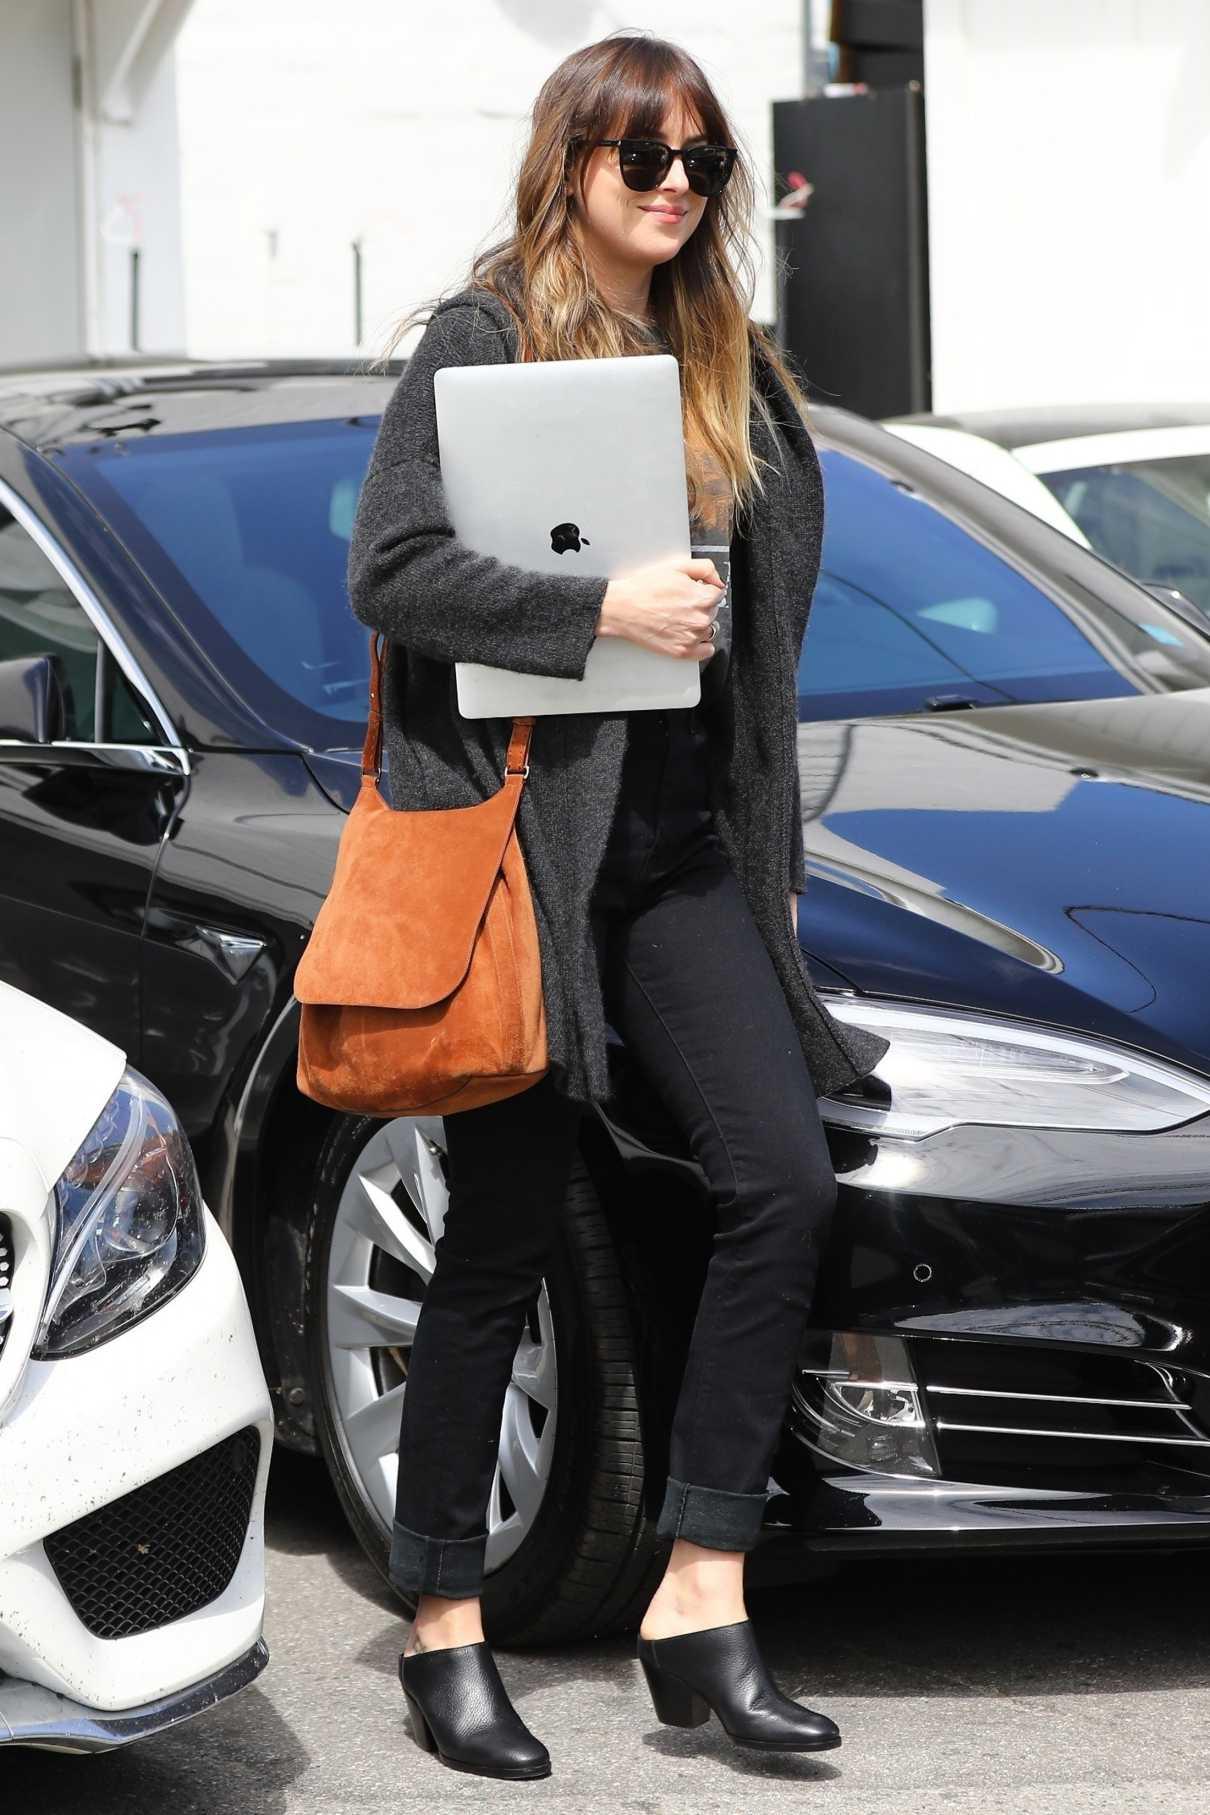 Dakota Johnson in a Gray Cardigan